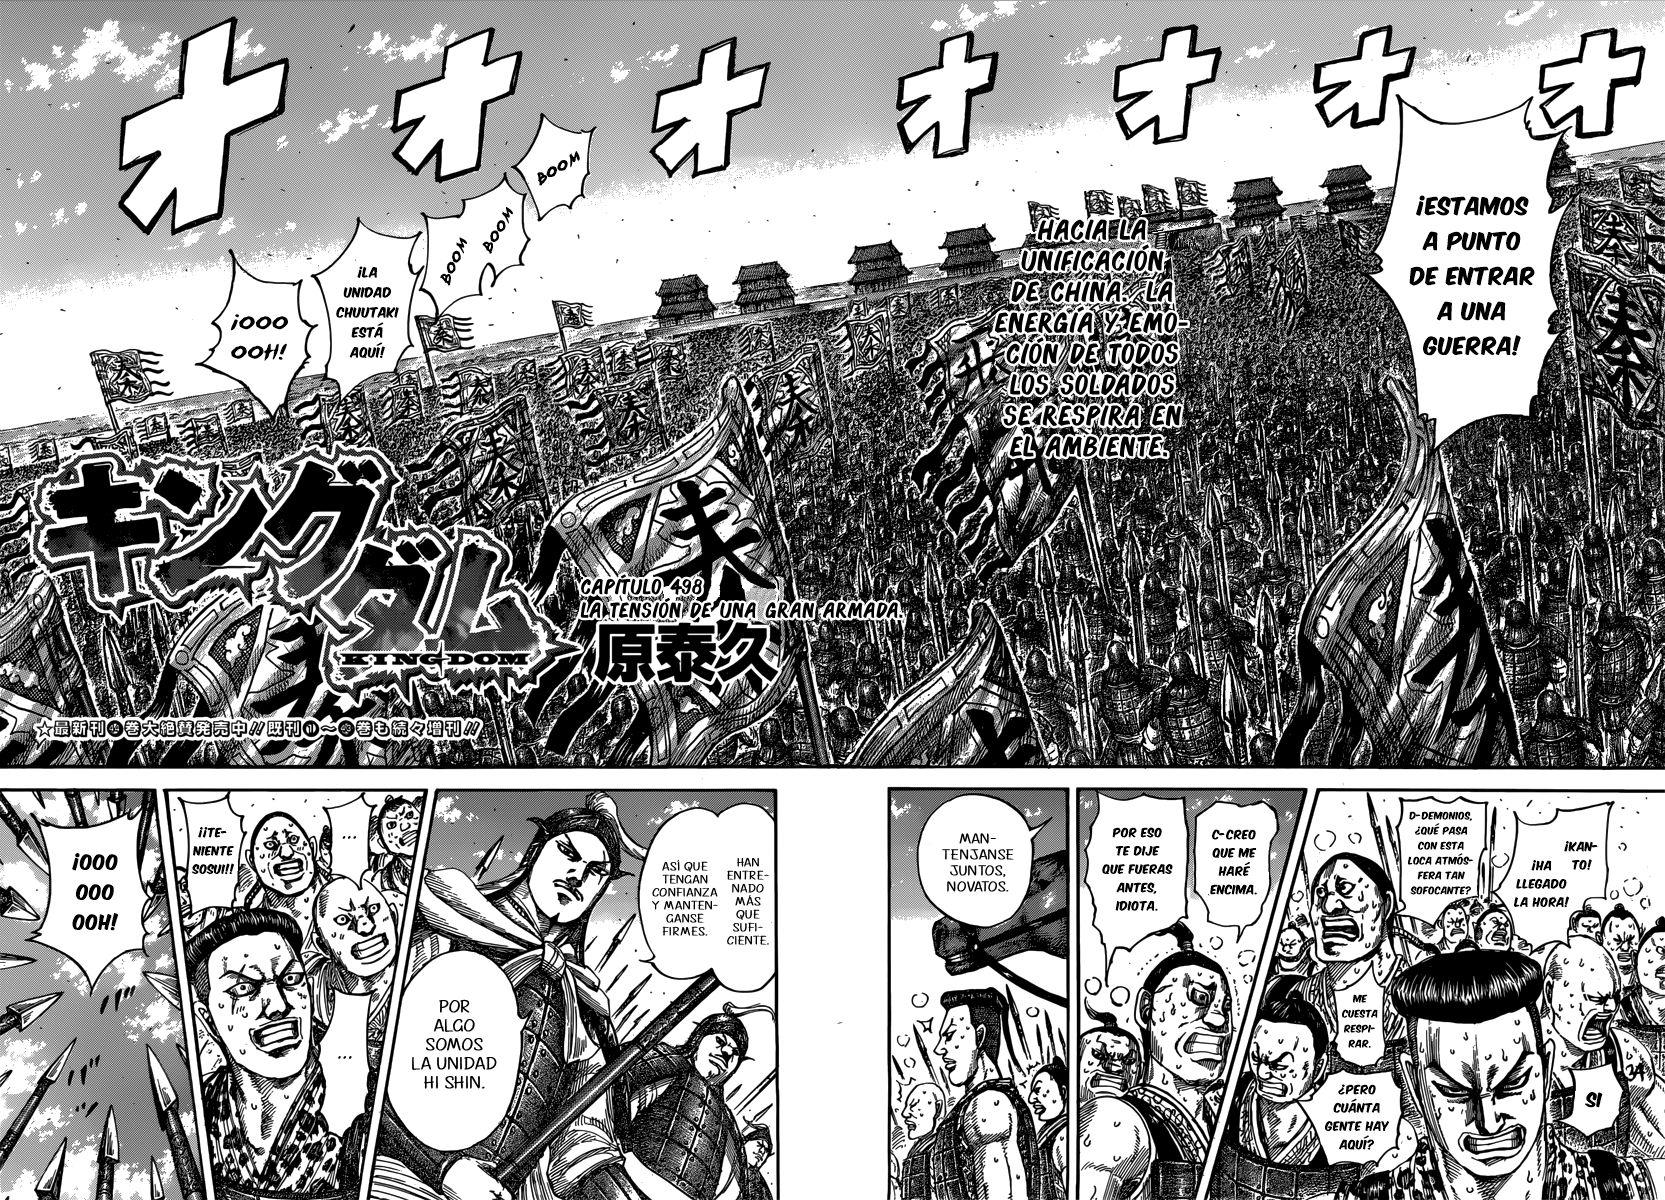 http://c5.ninemanga.com/es_manga/pic2/19/12307/518645/3c83f22f8bf52ec07d66c4440d0a7da3.jpg Page 4